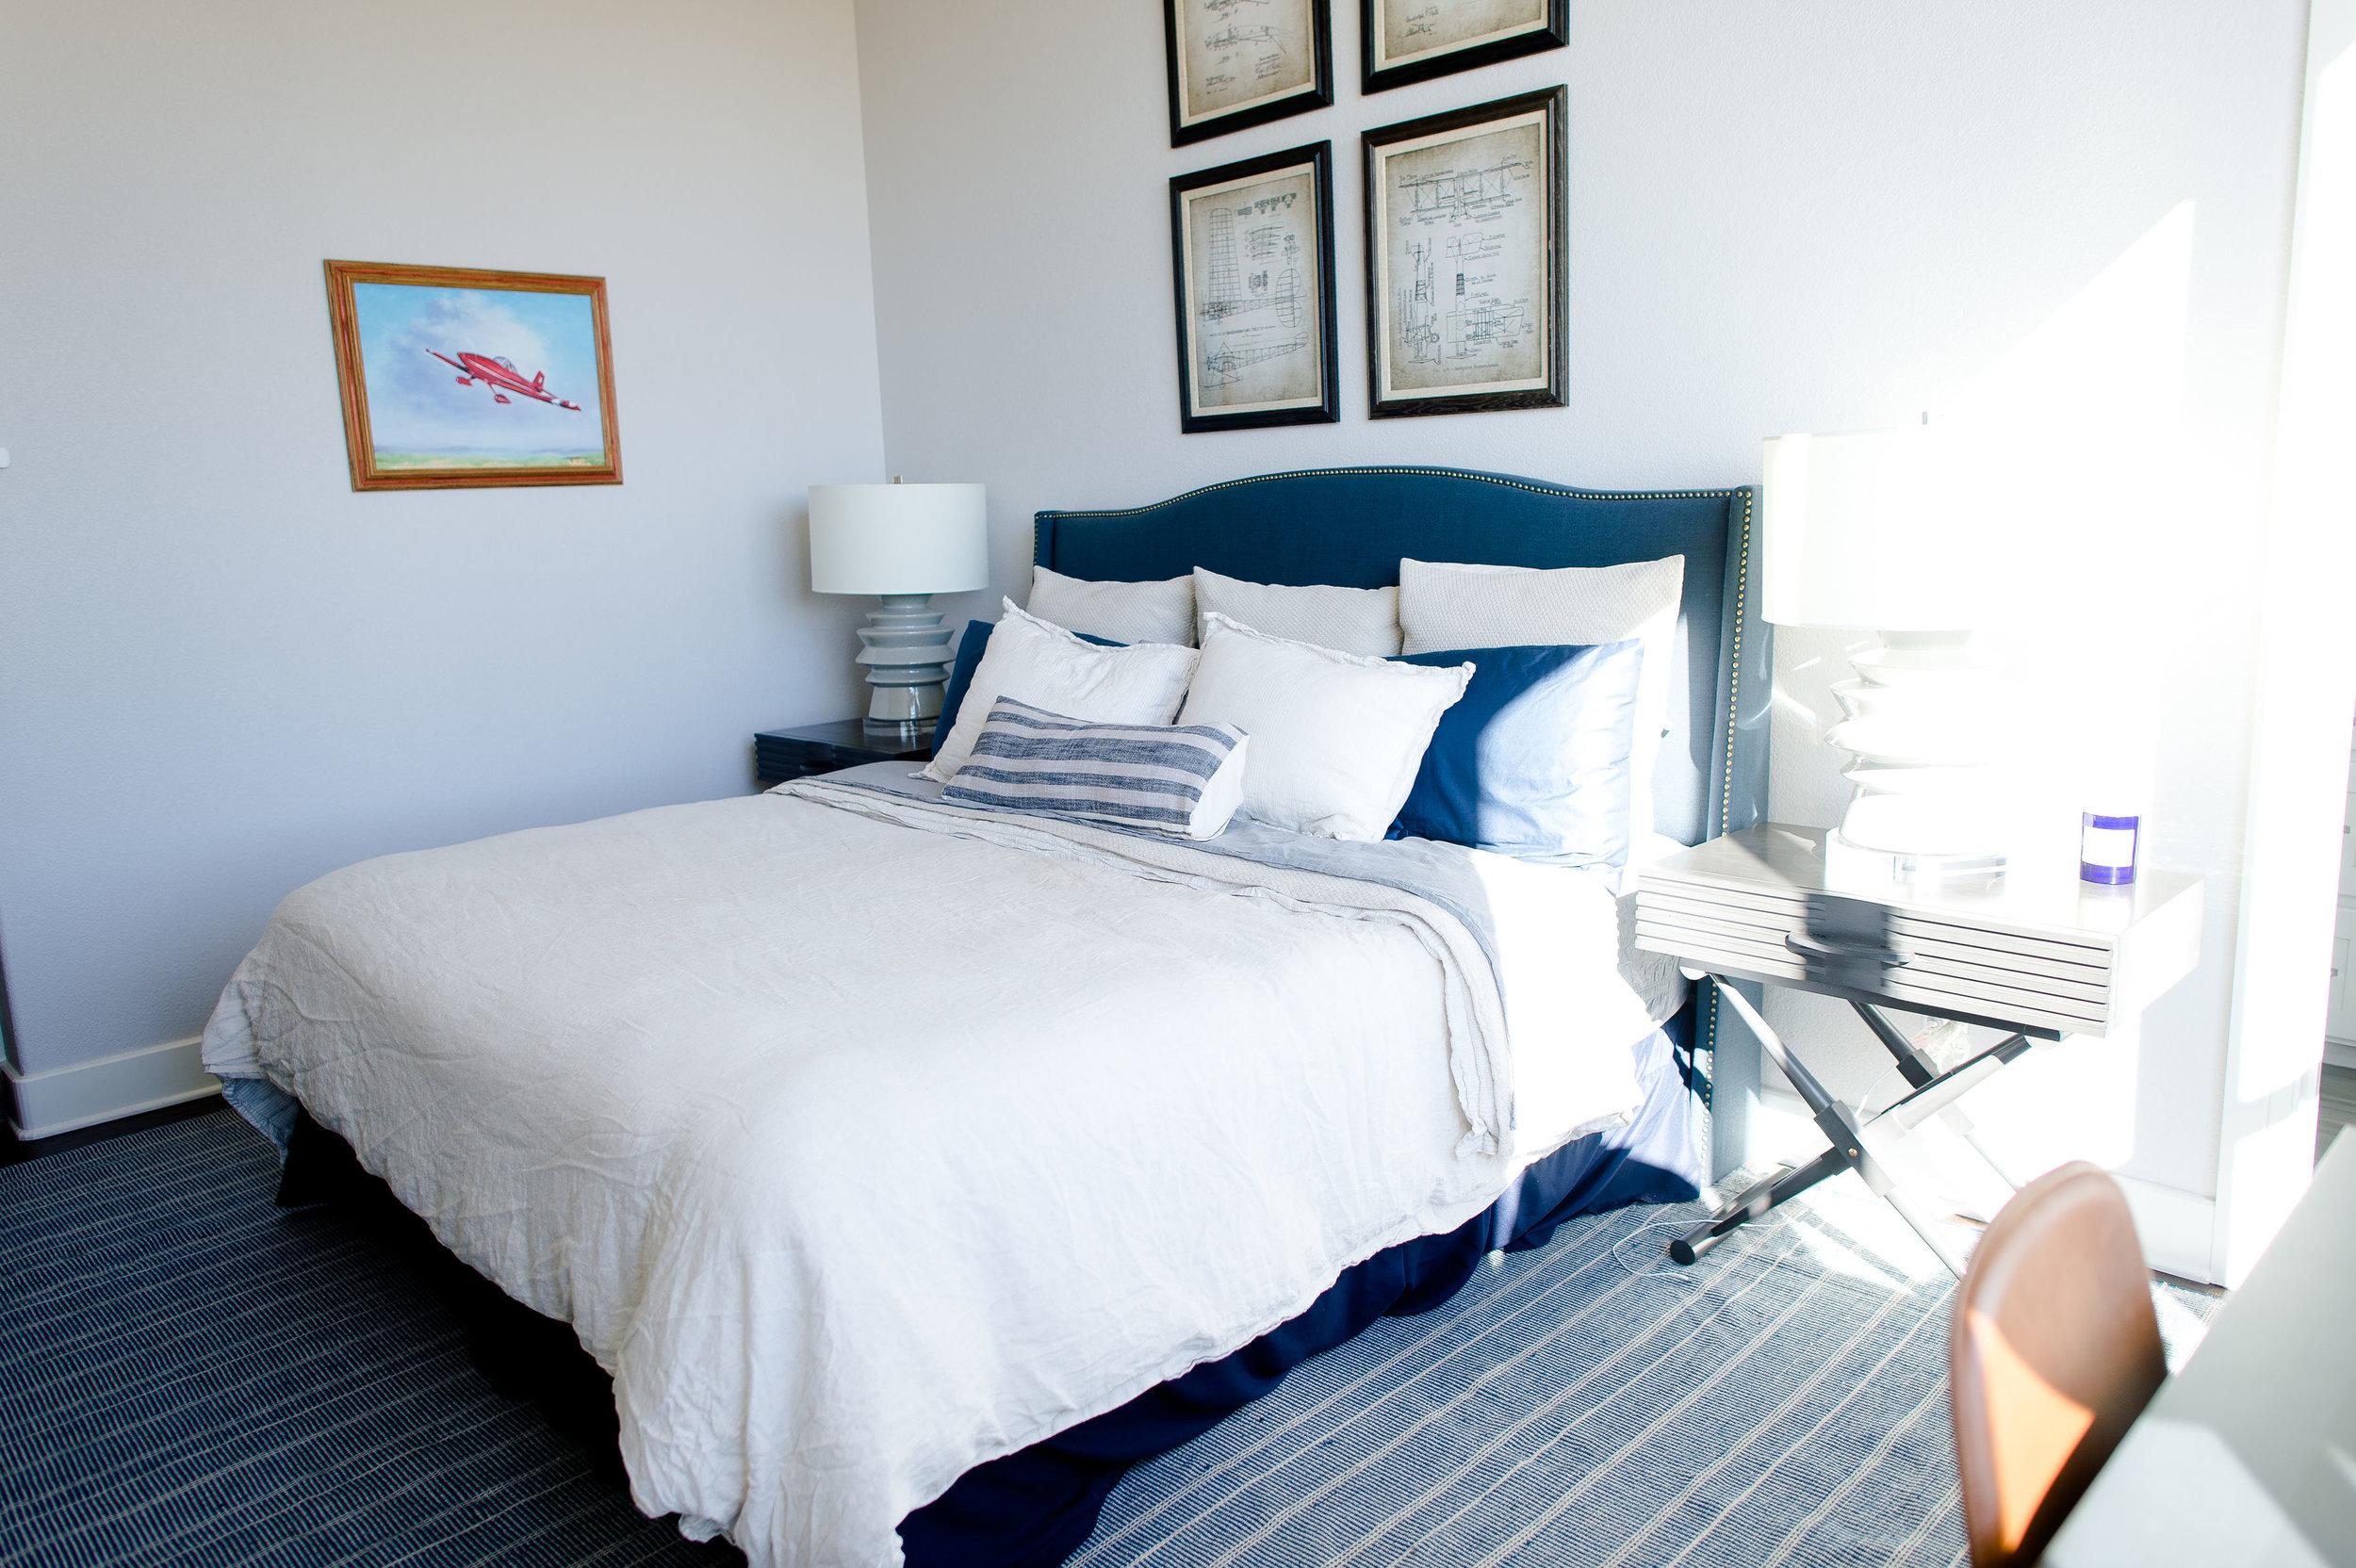 hill-country-transitional-clark-design-studio-wichita-falls-tx-boys-bedroom.jpg